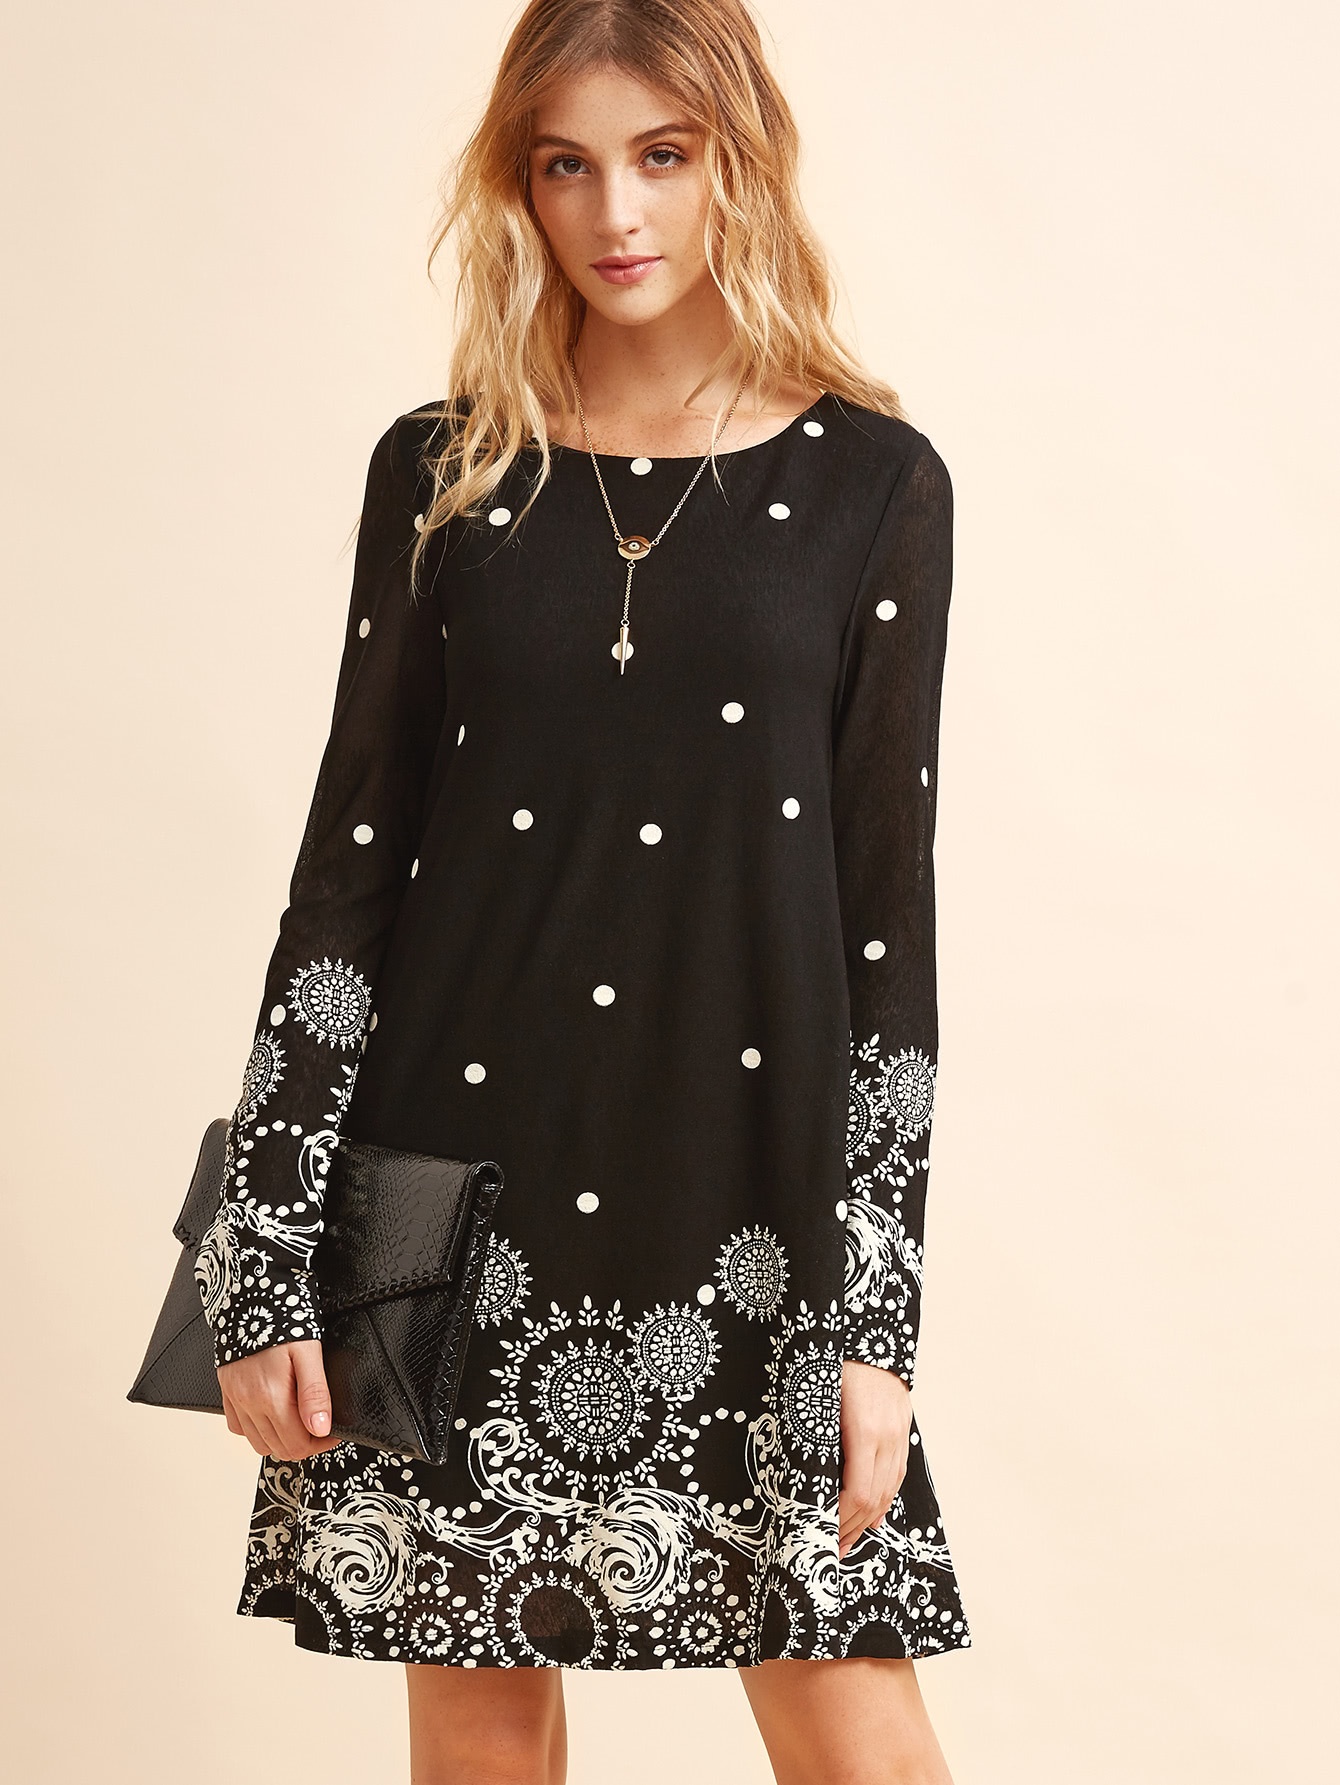 Retro Circle & Polka Dot Print Tunic Dress